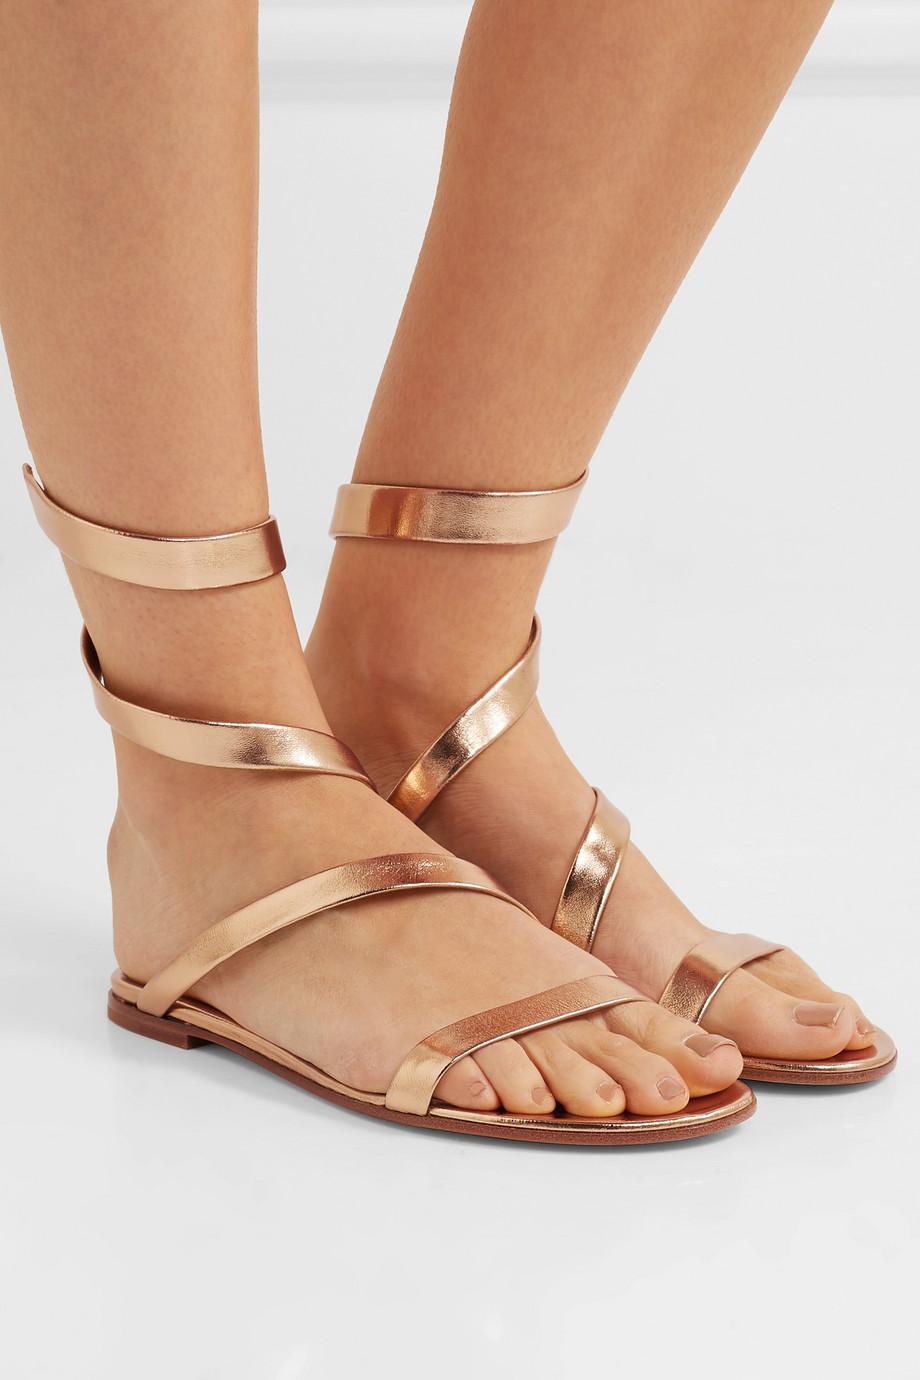 Gianvito Rossi Opera metallic leather sandals